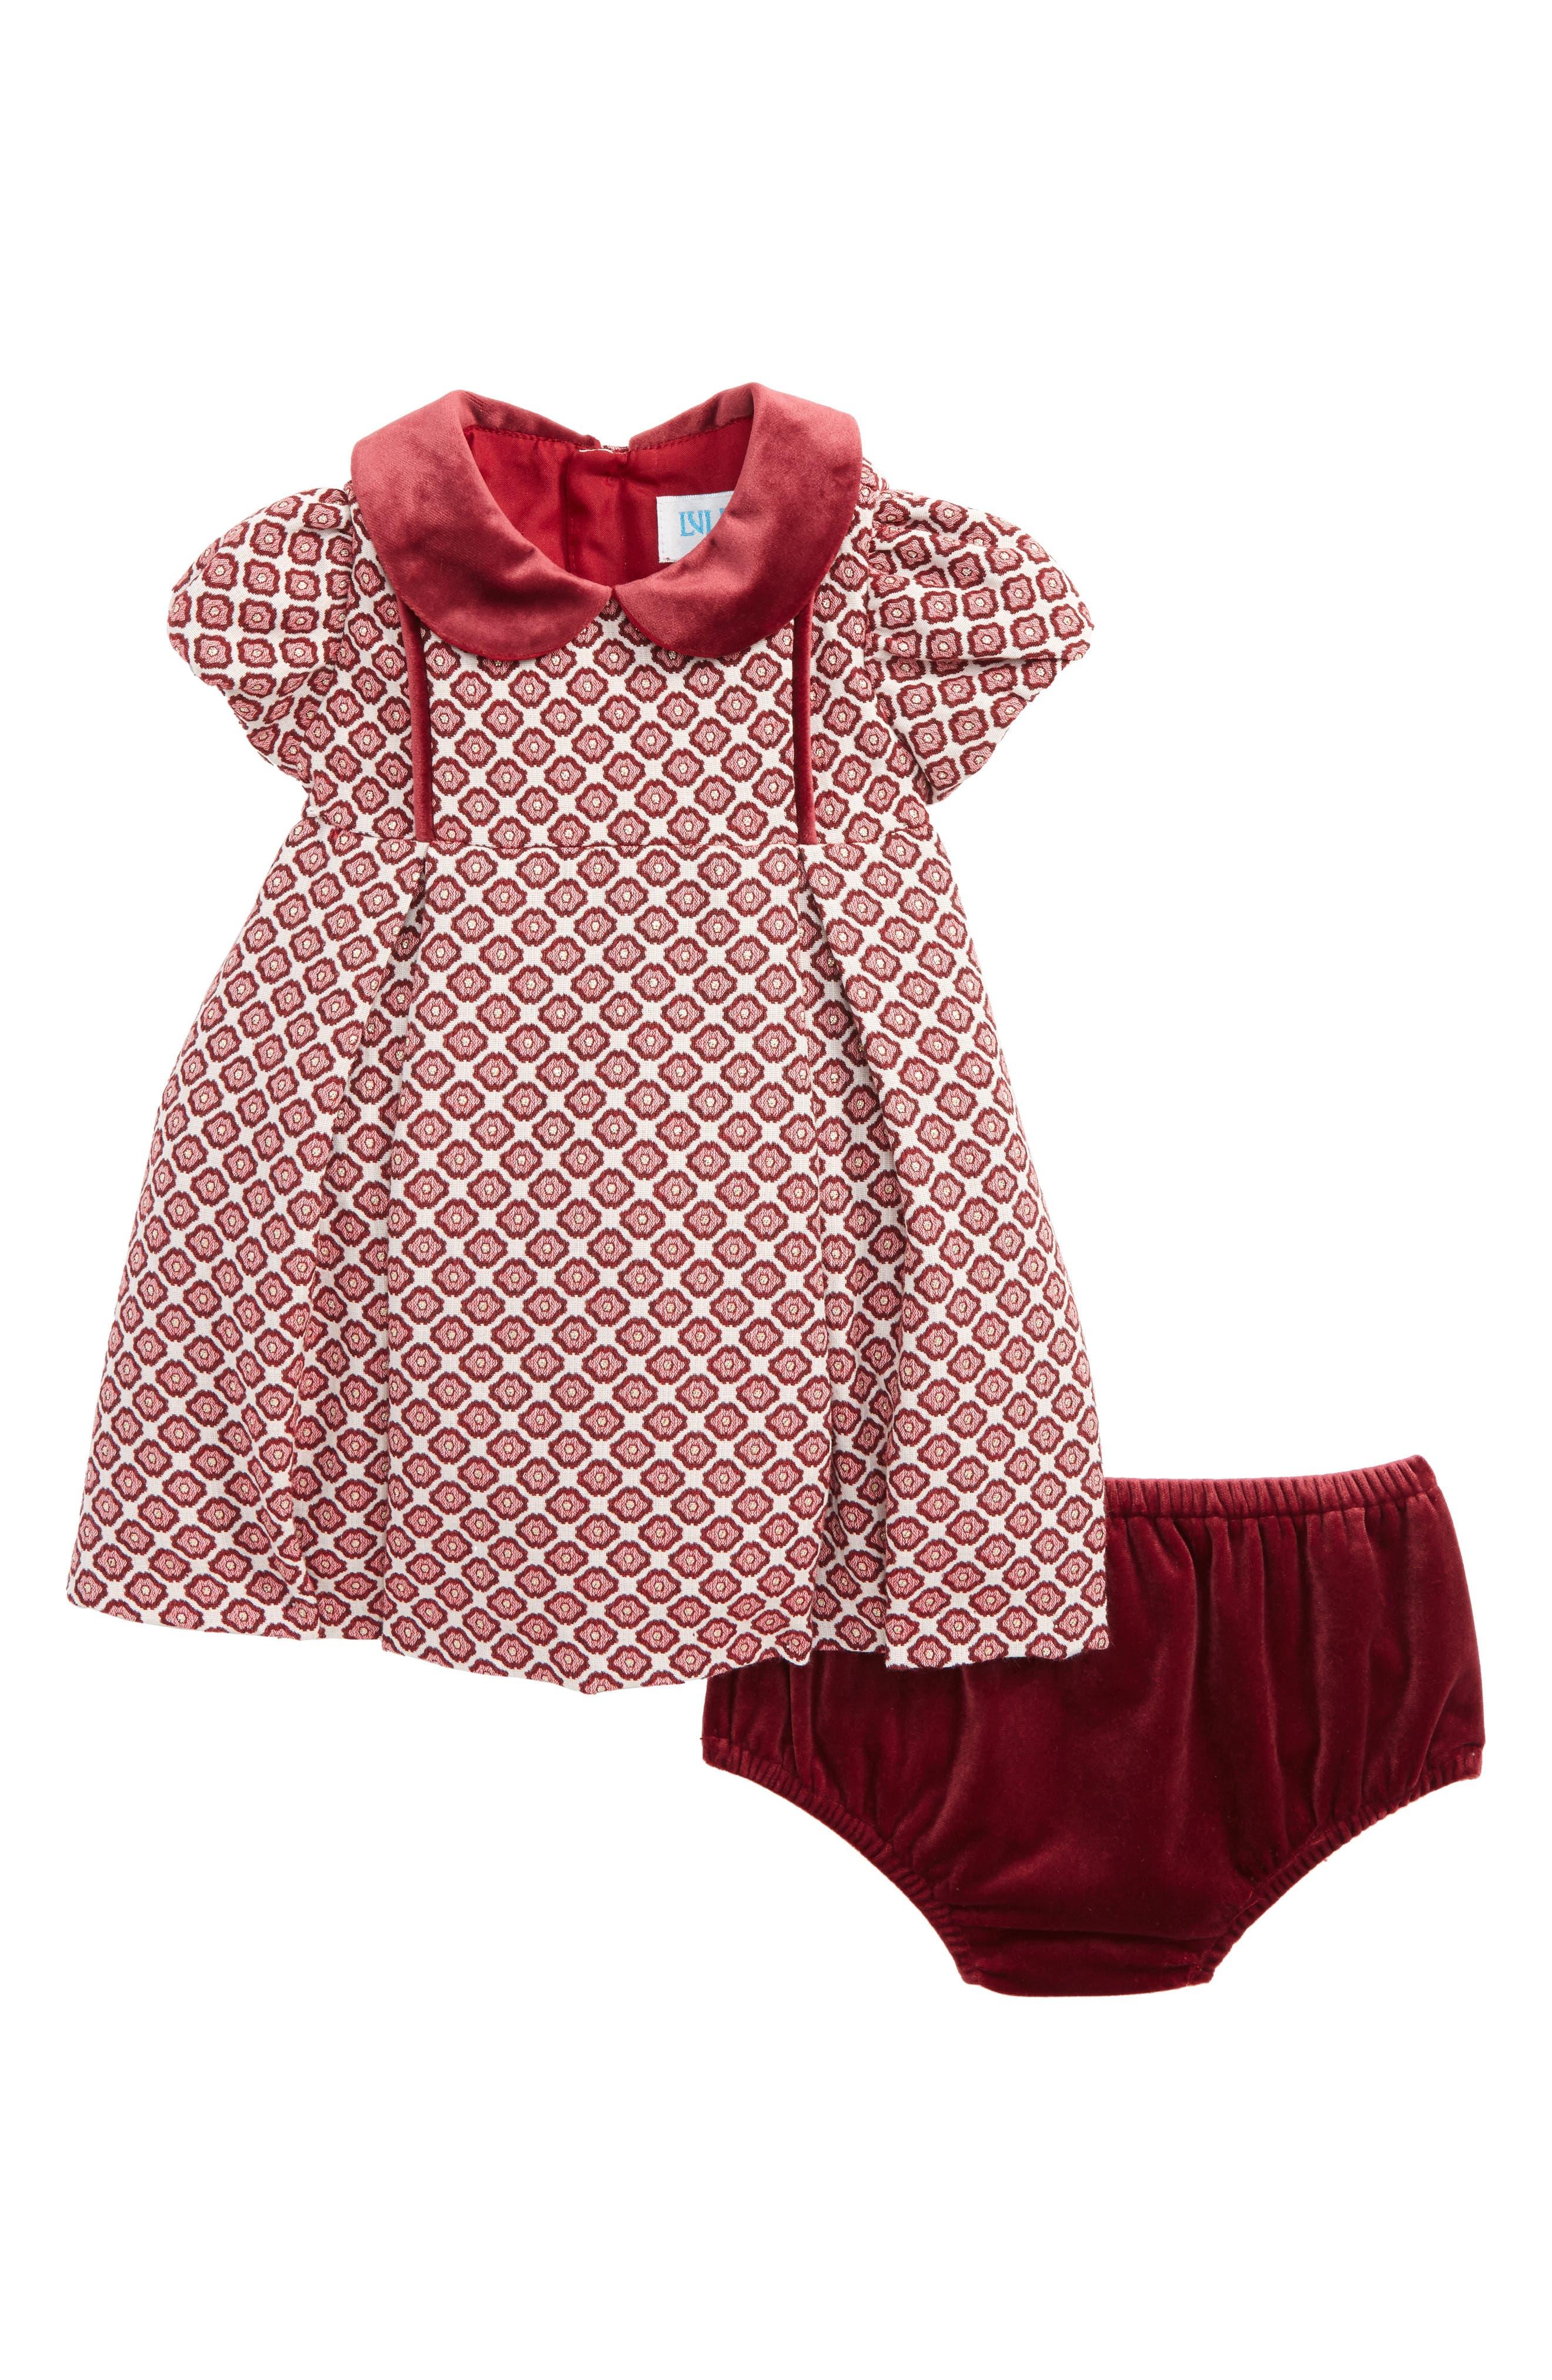 Alternate Image 1 Selected - Luli & Me Floral Jacquard Dress (Baby Girls)